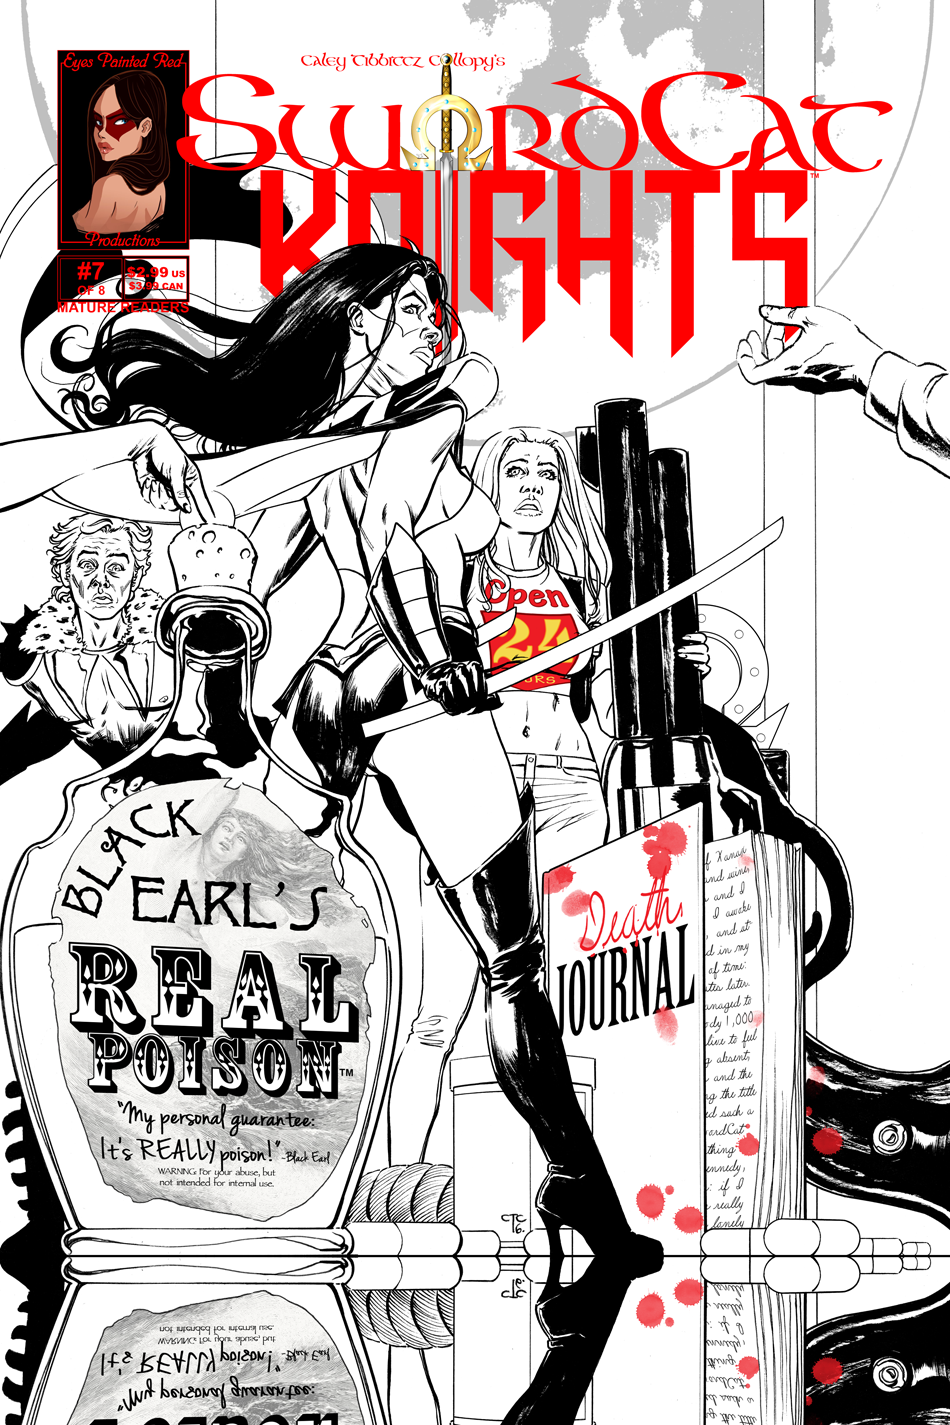 Iss. 7 Cover | SwordCat Princess